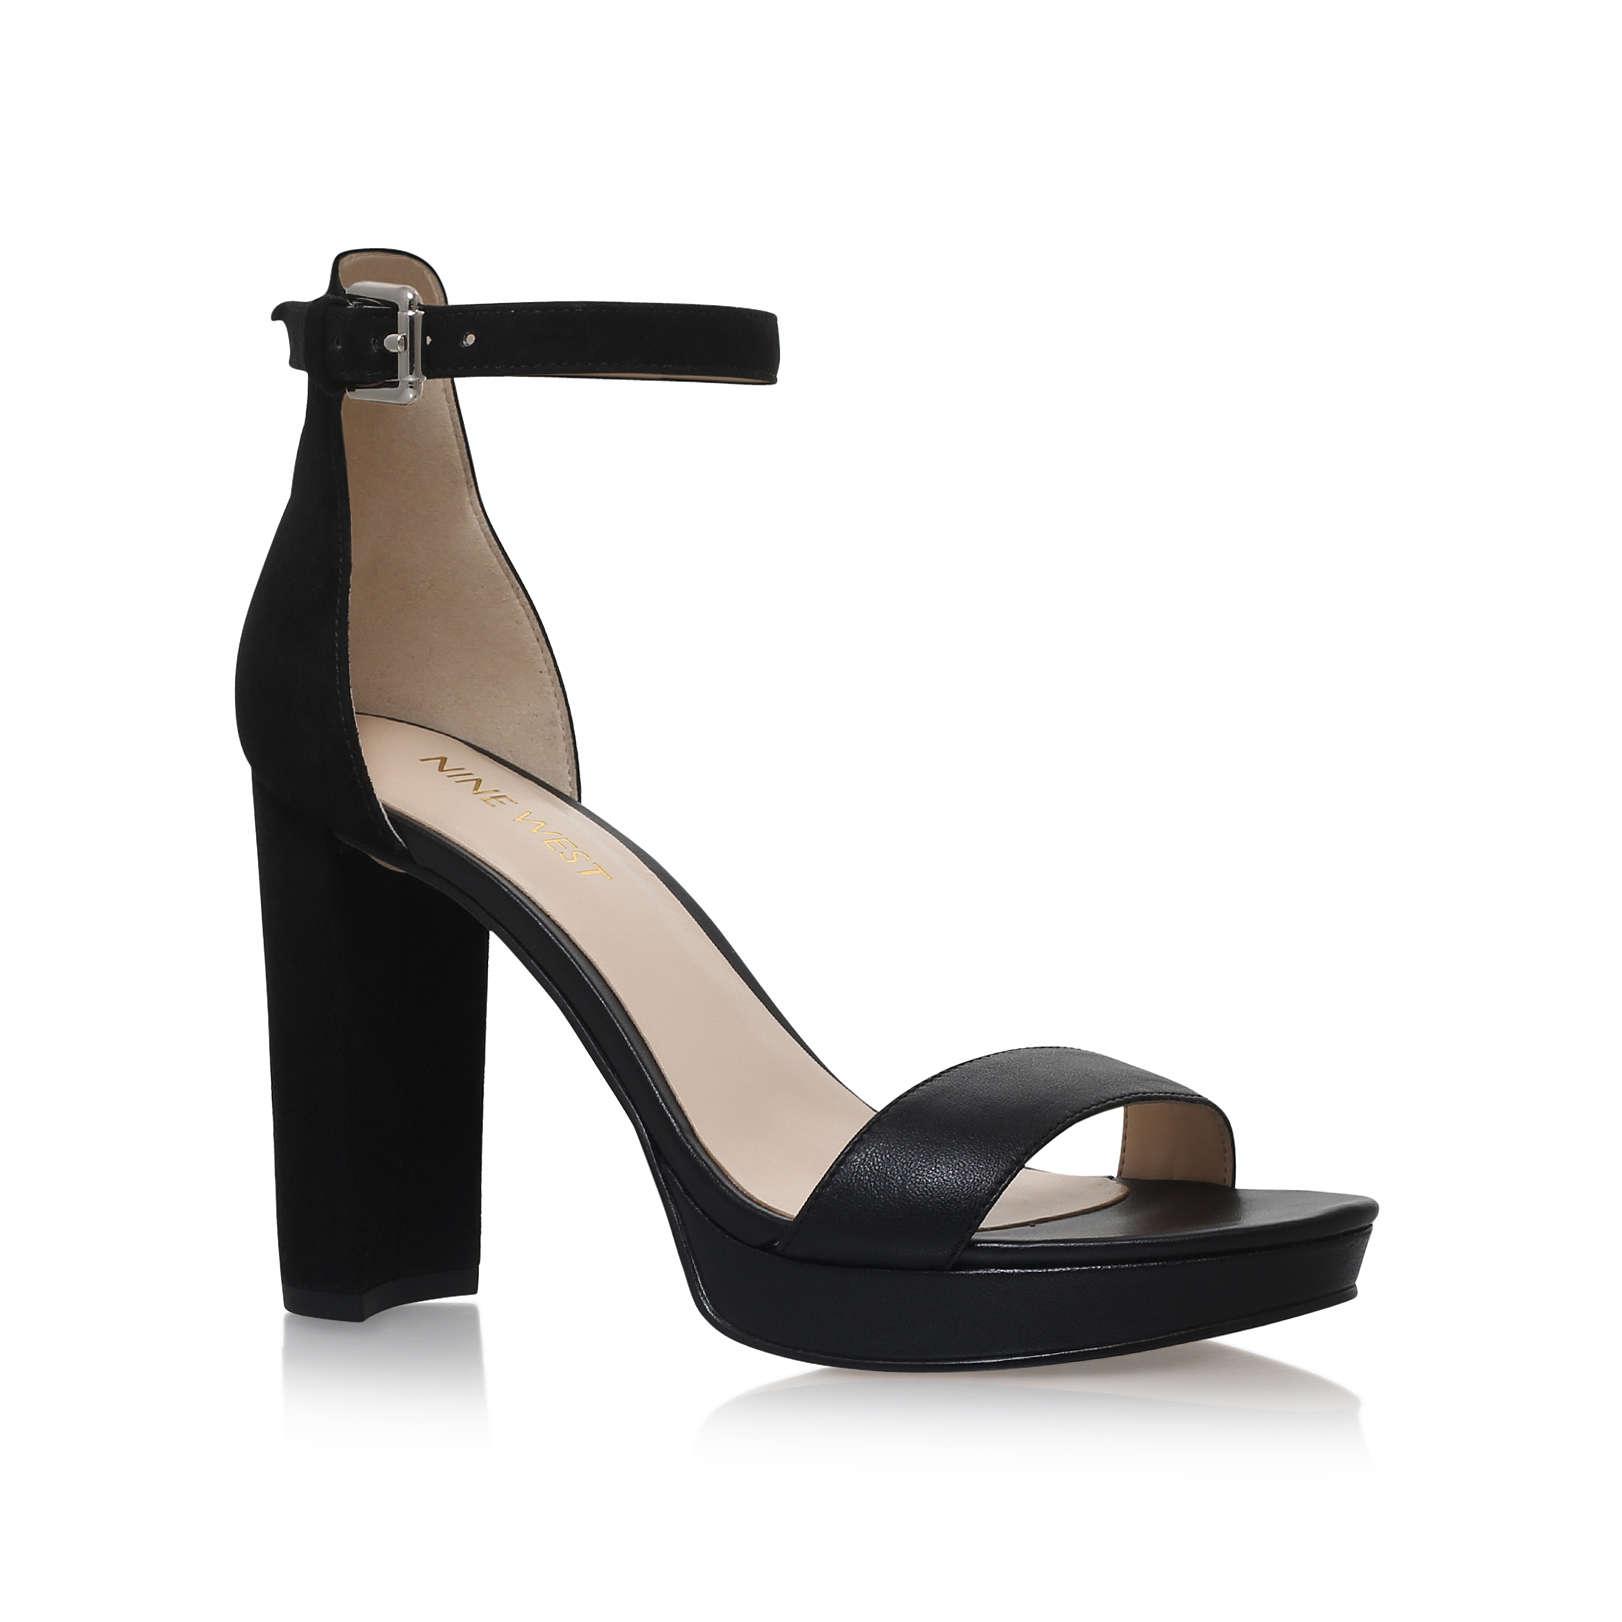 DEMPSEY Nine West Dempsey Black High Heel Sandals Block Heel by NINE WEST 2e0b619cc95c